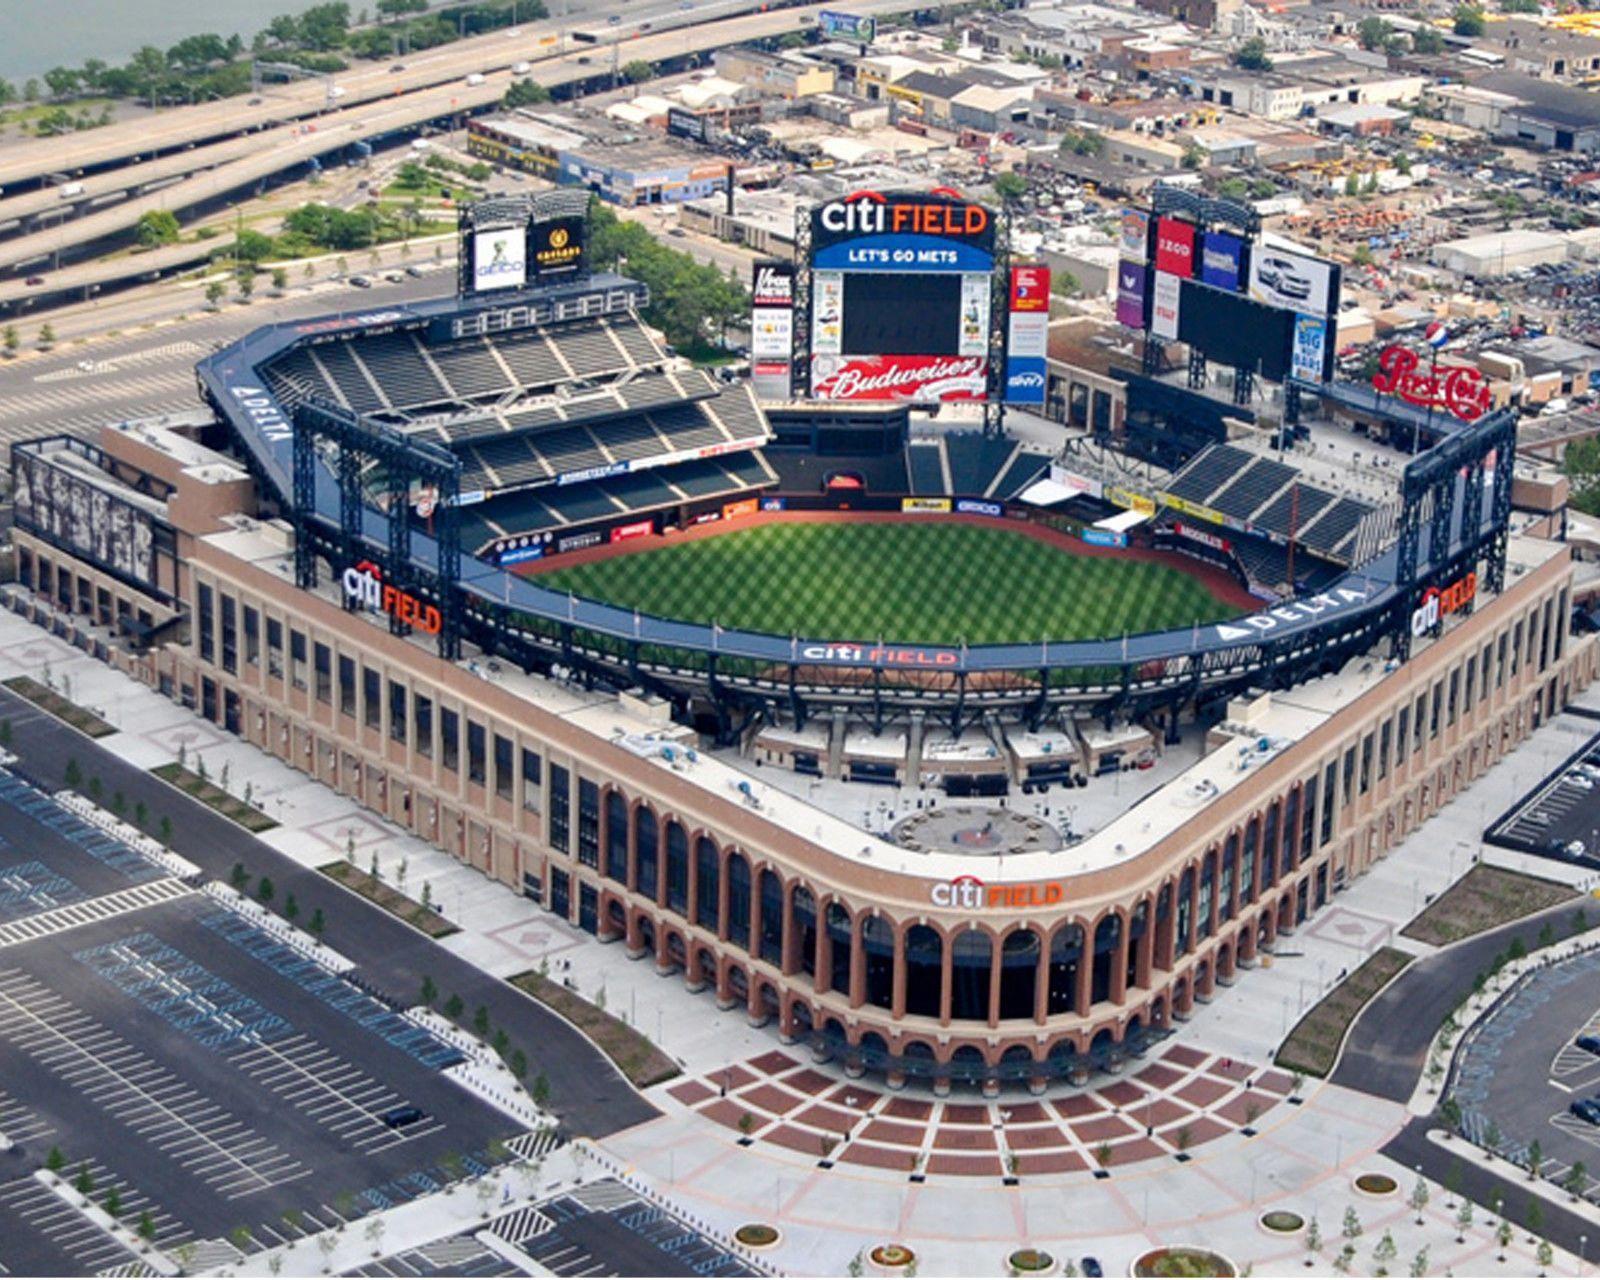 Citi Field New York Mets Stadium New York City 8x10 Photo Picture New York Mets Stadium Baseball Park Mlb Stadiums